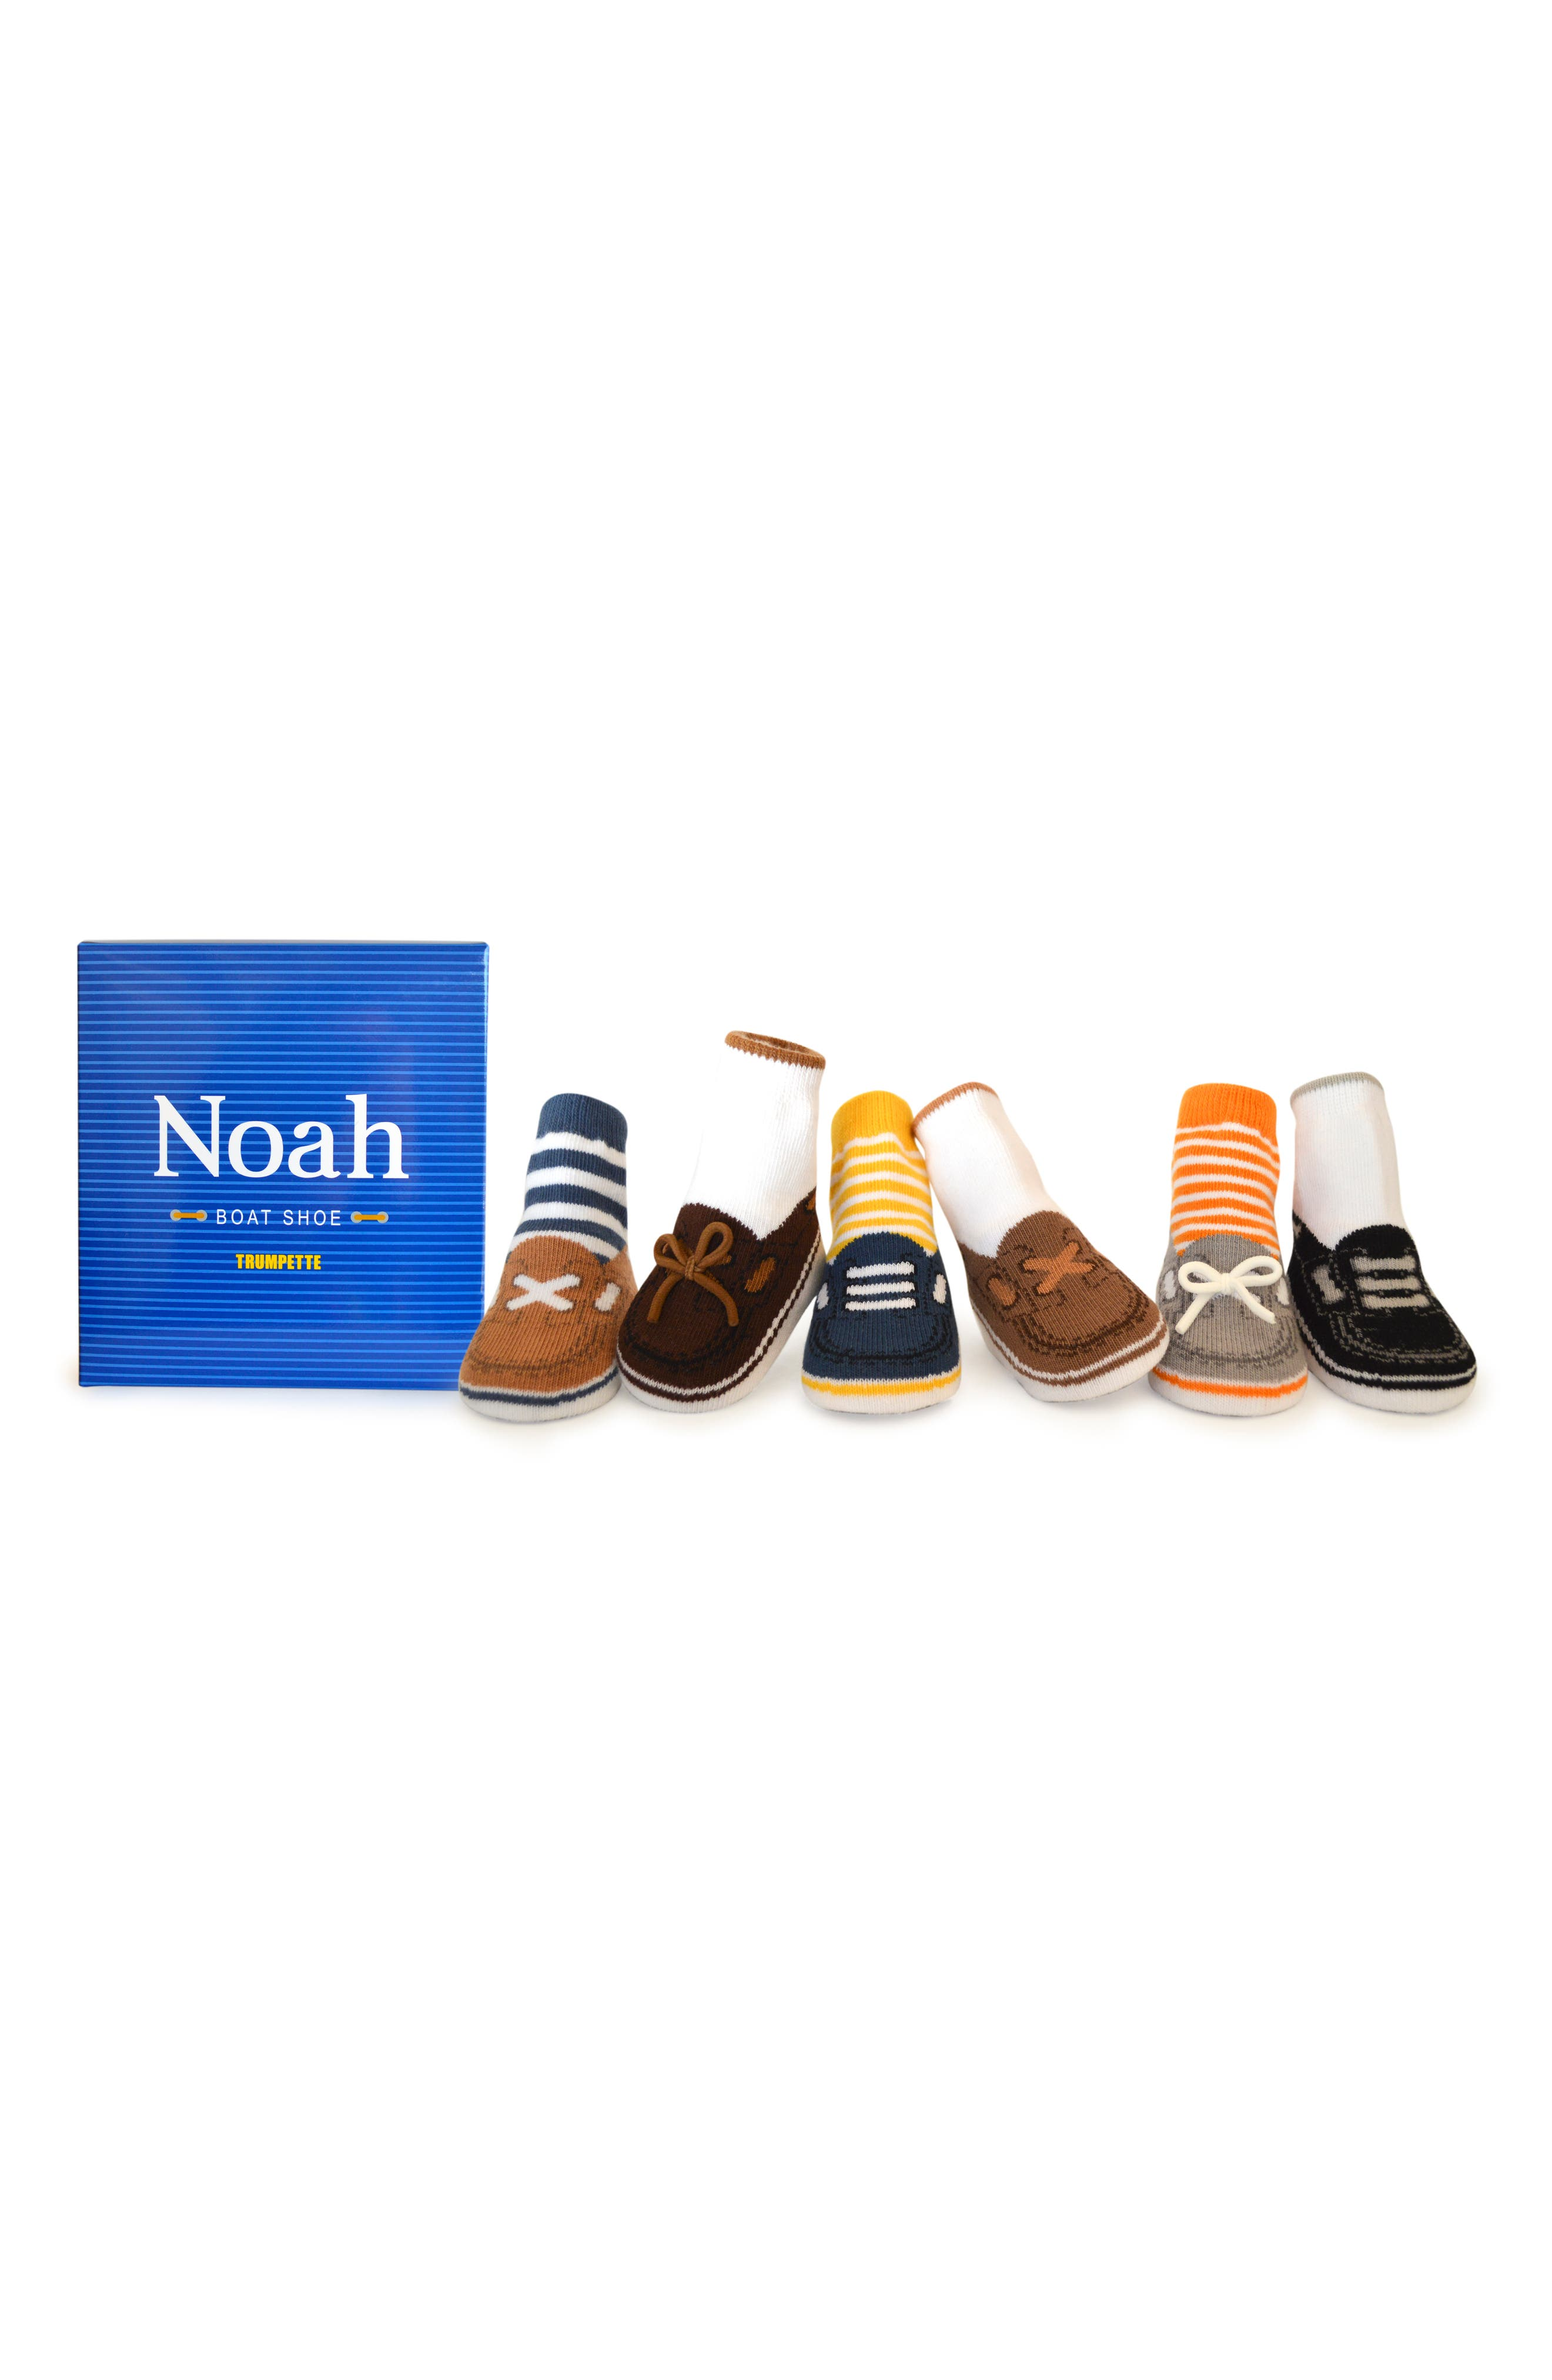 Noah 6-Pack Socks,                             Main thumbnail 1, color,                             ASSORTED NEUTRAL